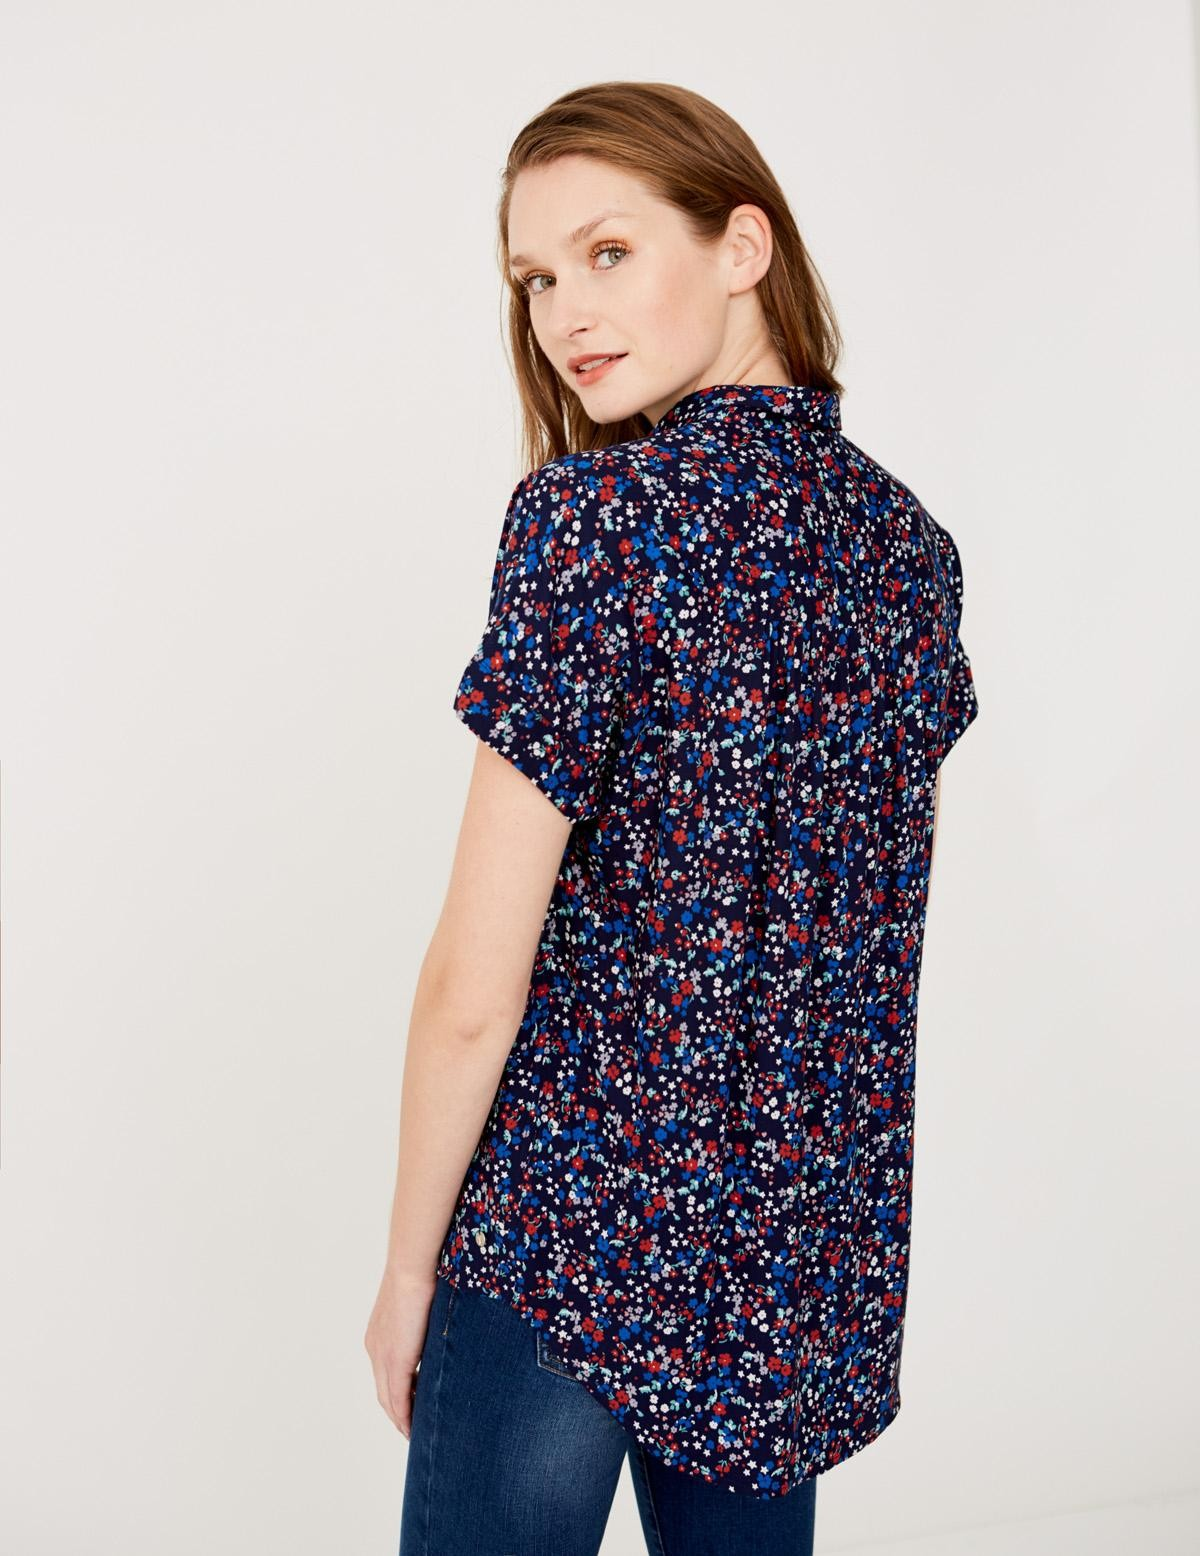 Camisa micro estampado flores - Ítem2